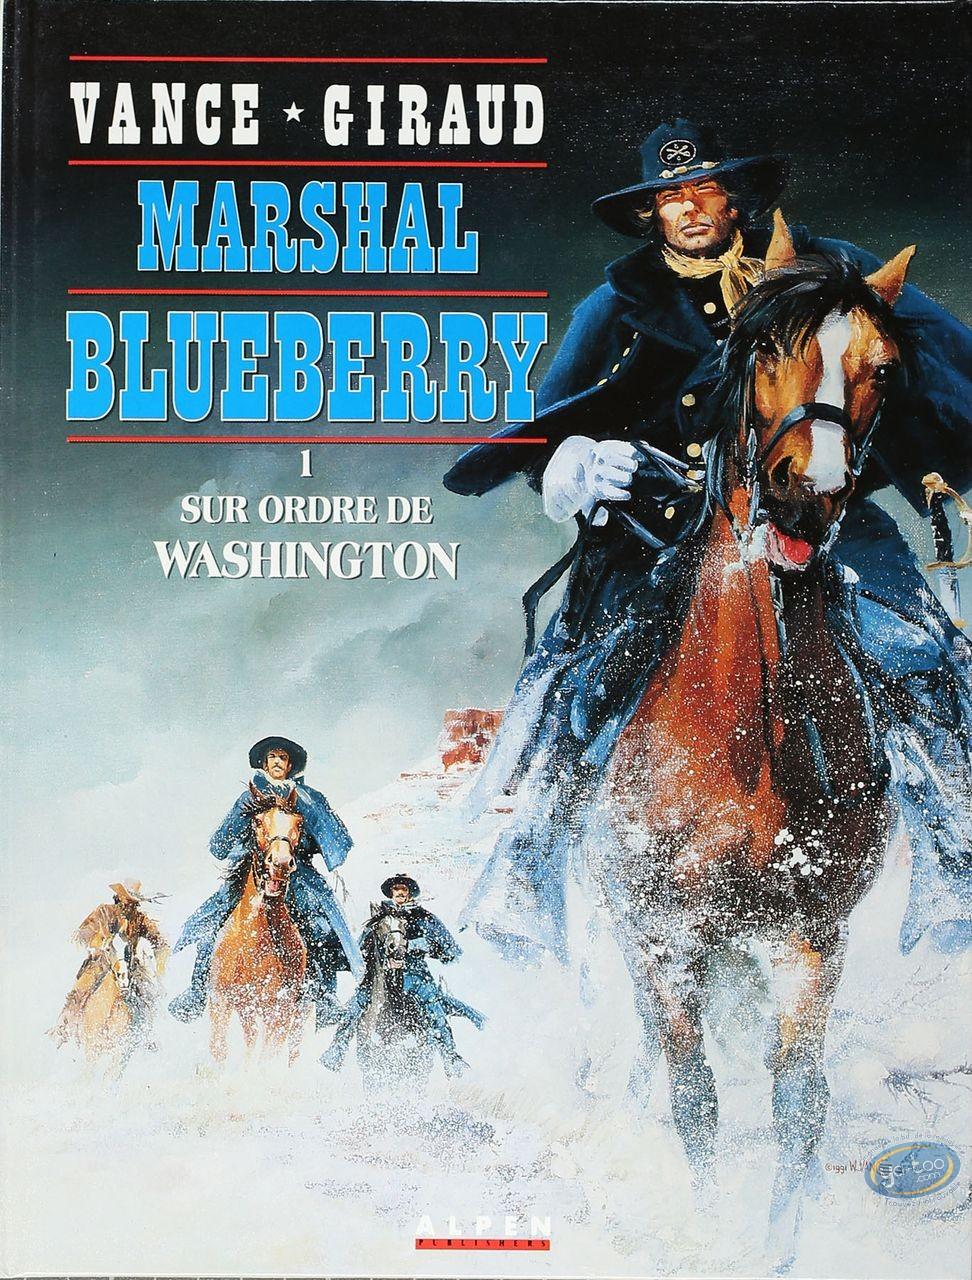 Listed European Comic Books, Marshall Blueberry : Sur Ordre de Washington